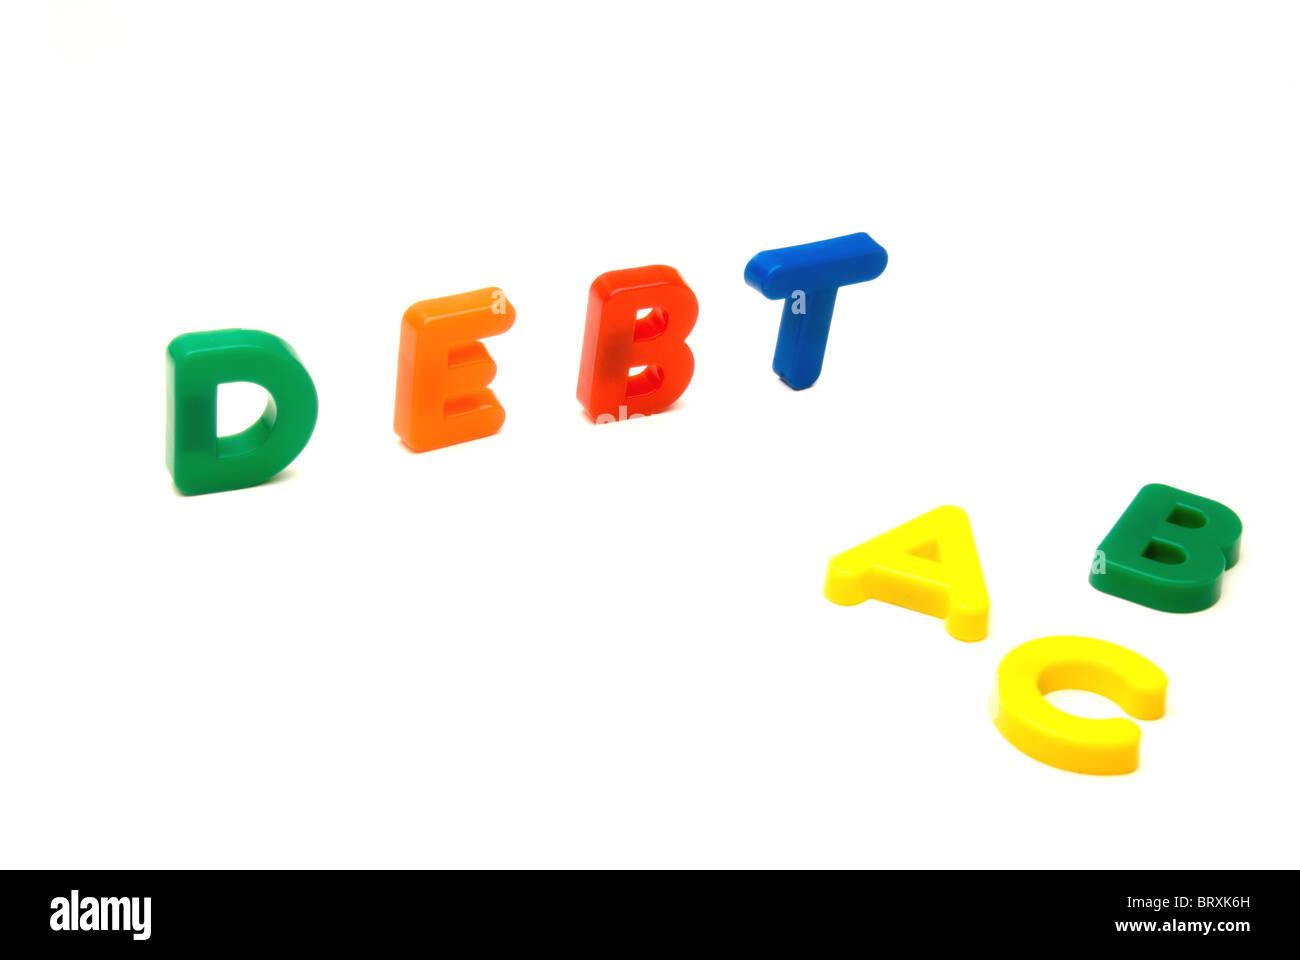 Debt education - Stock Image